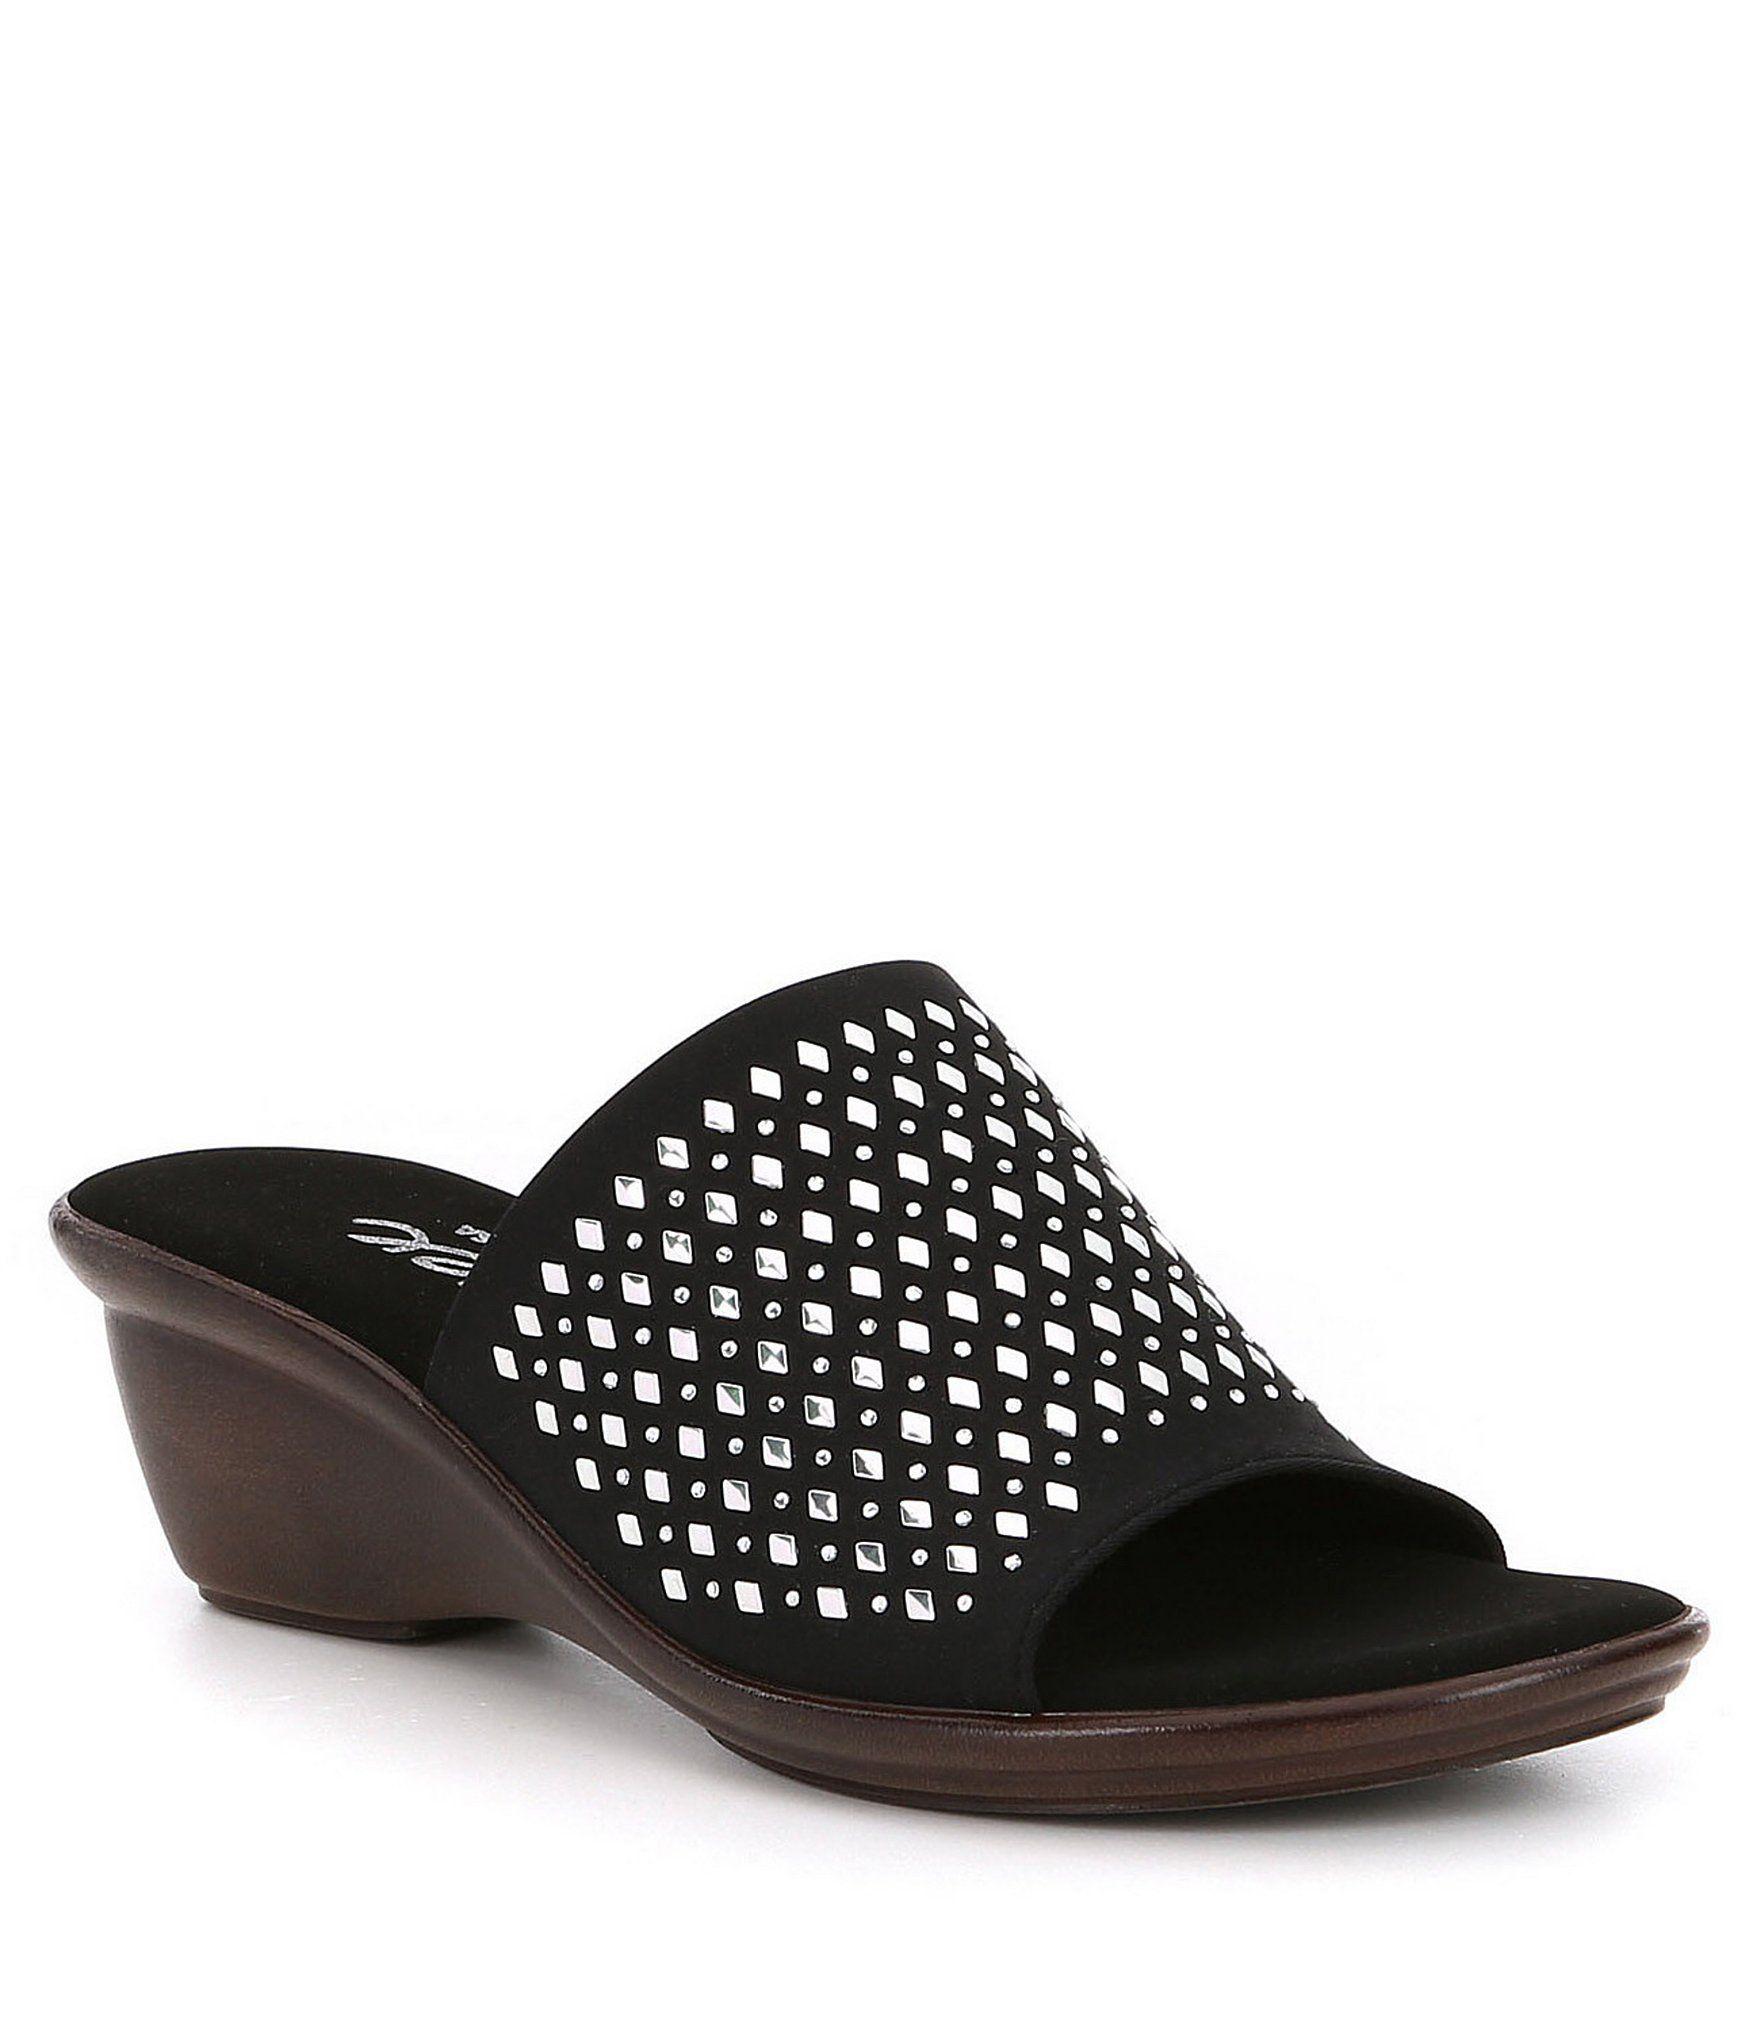 Izzy Rhinestone Studded Detail Leather Slip-On Sandals sWsGVp4Uh